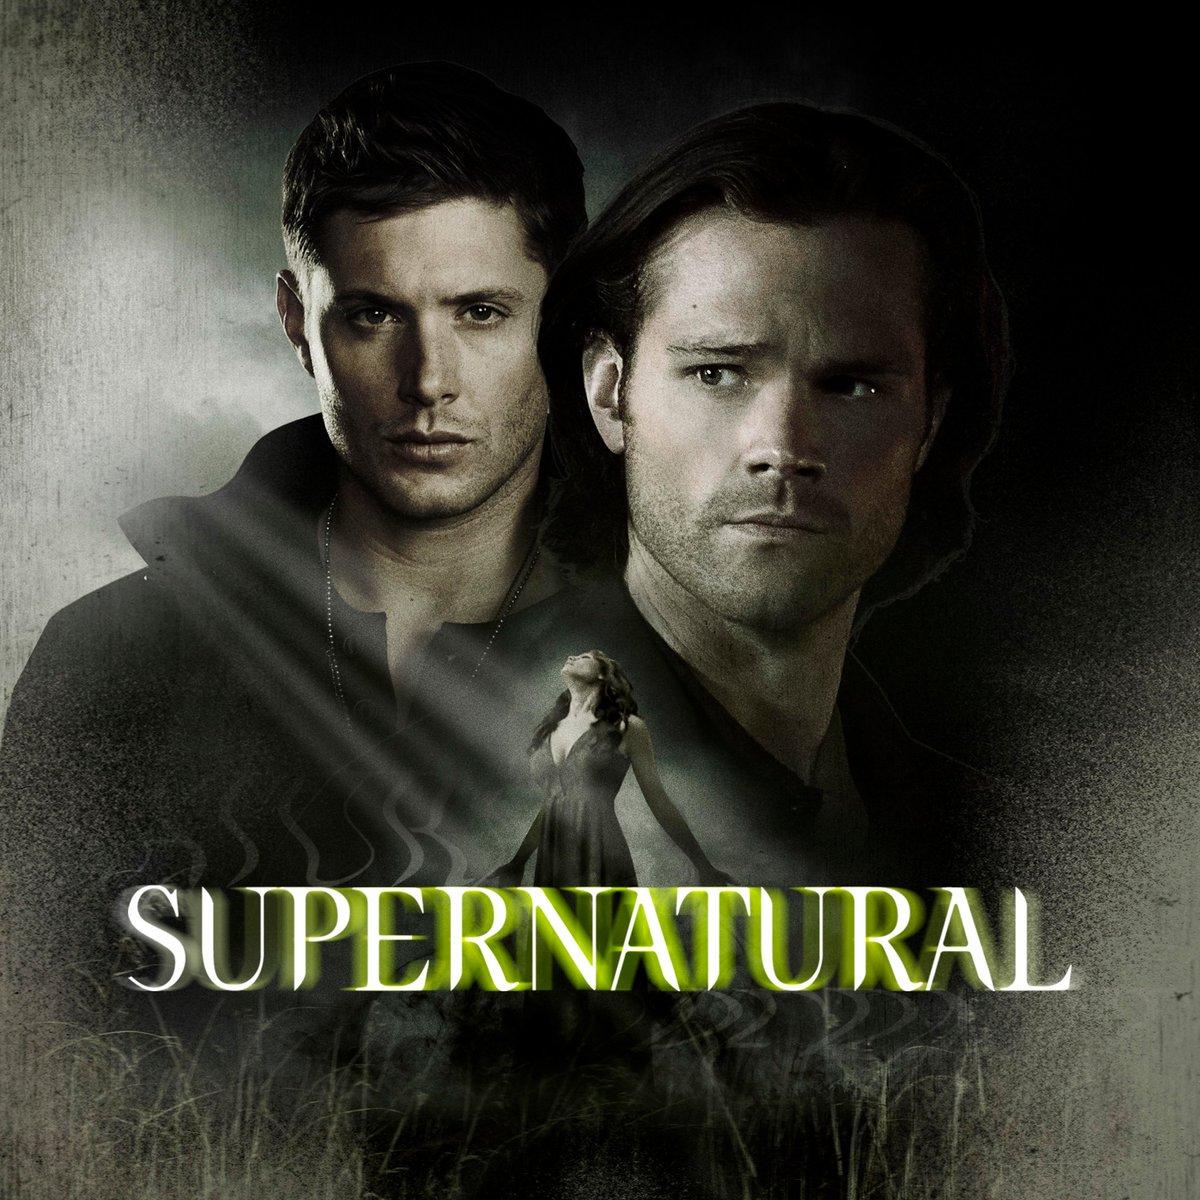 #Supernatural Season 11 Boxart from Windows Store.. https://t.co/xGPLXXU5I8